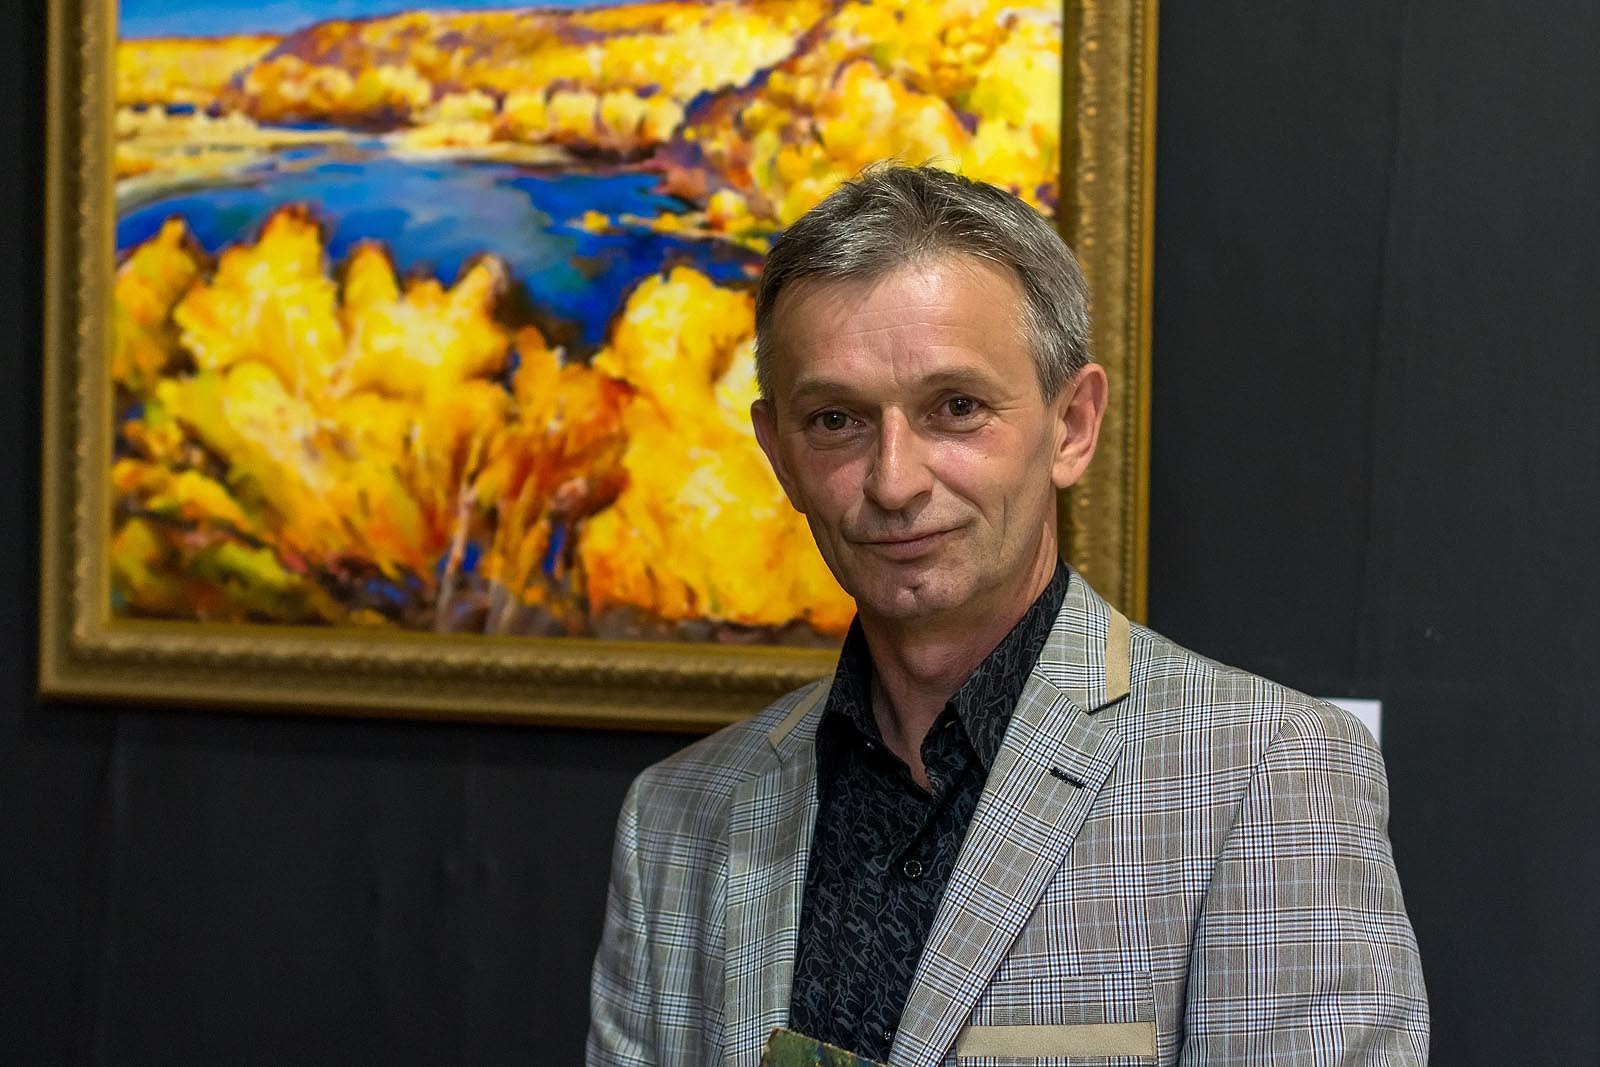 Биография мингазов радик халитович в Новичихе,Баяндае,Полесске